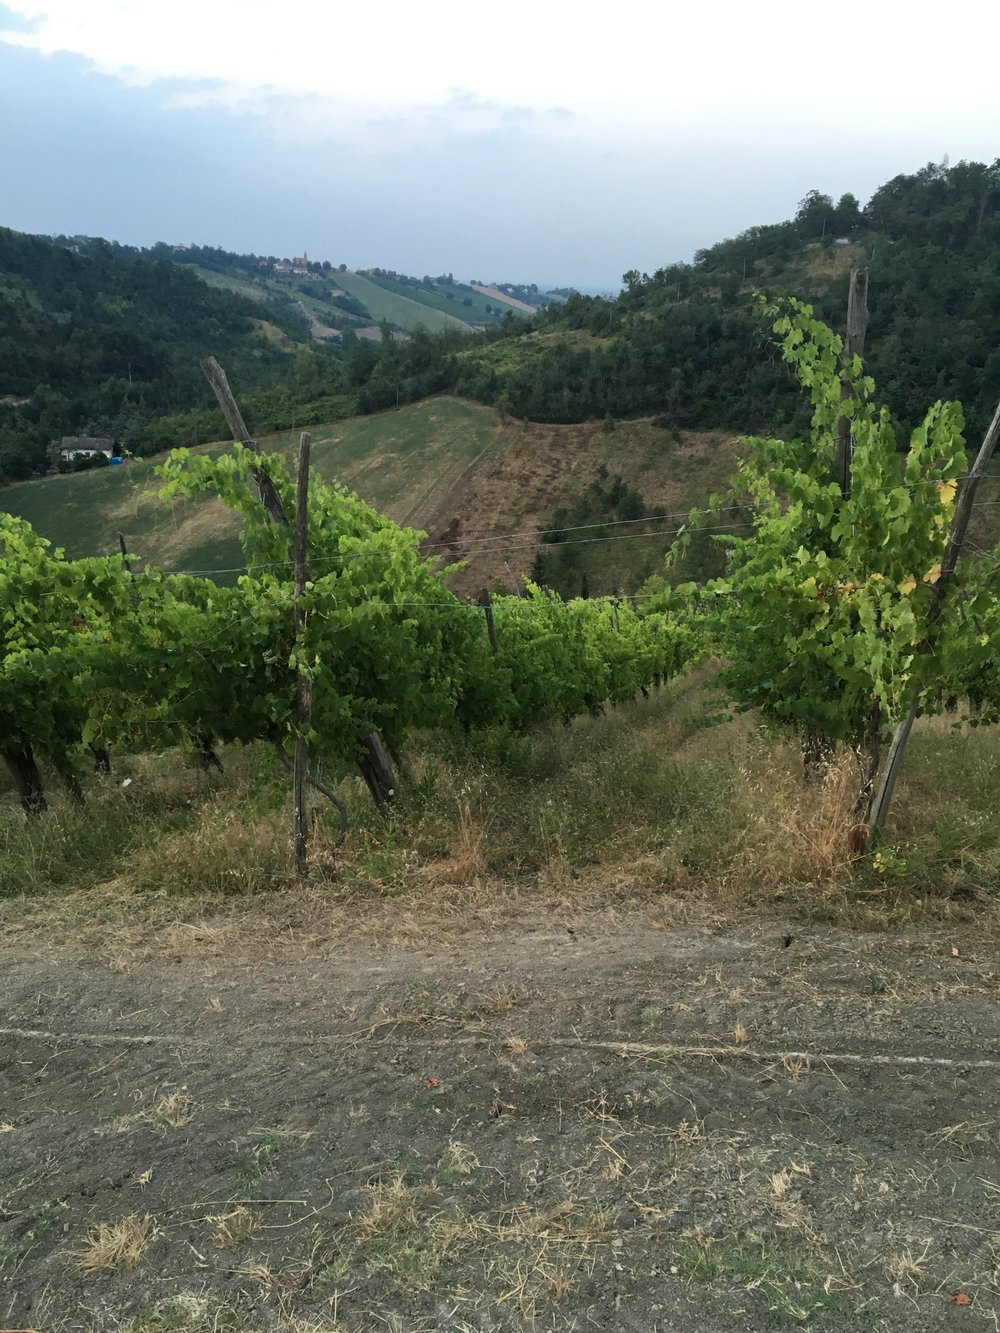 Gradizzolo wijngaard 2.jpg